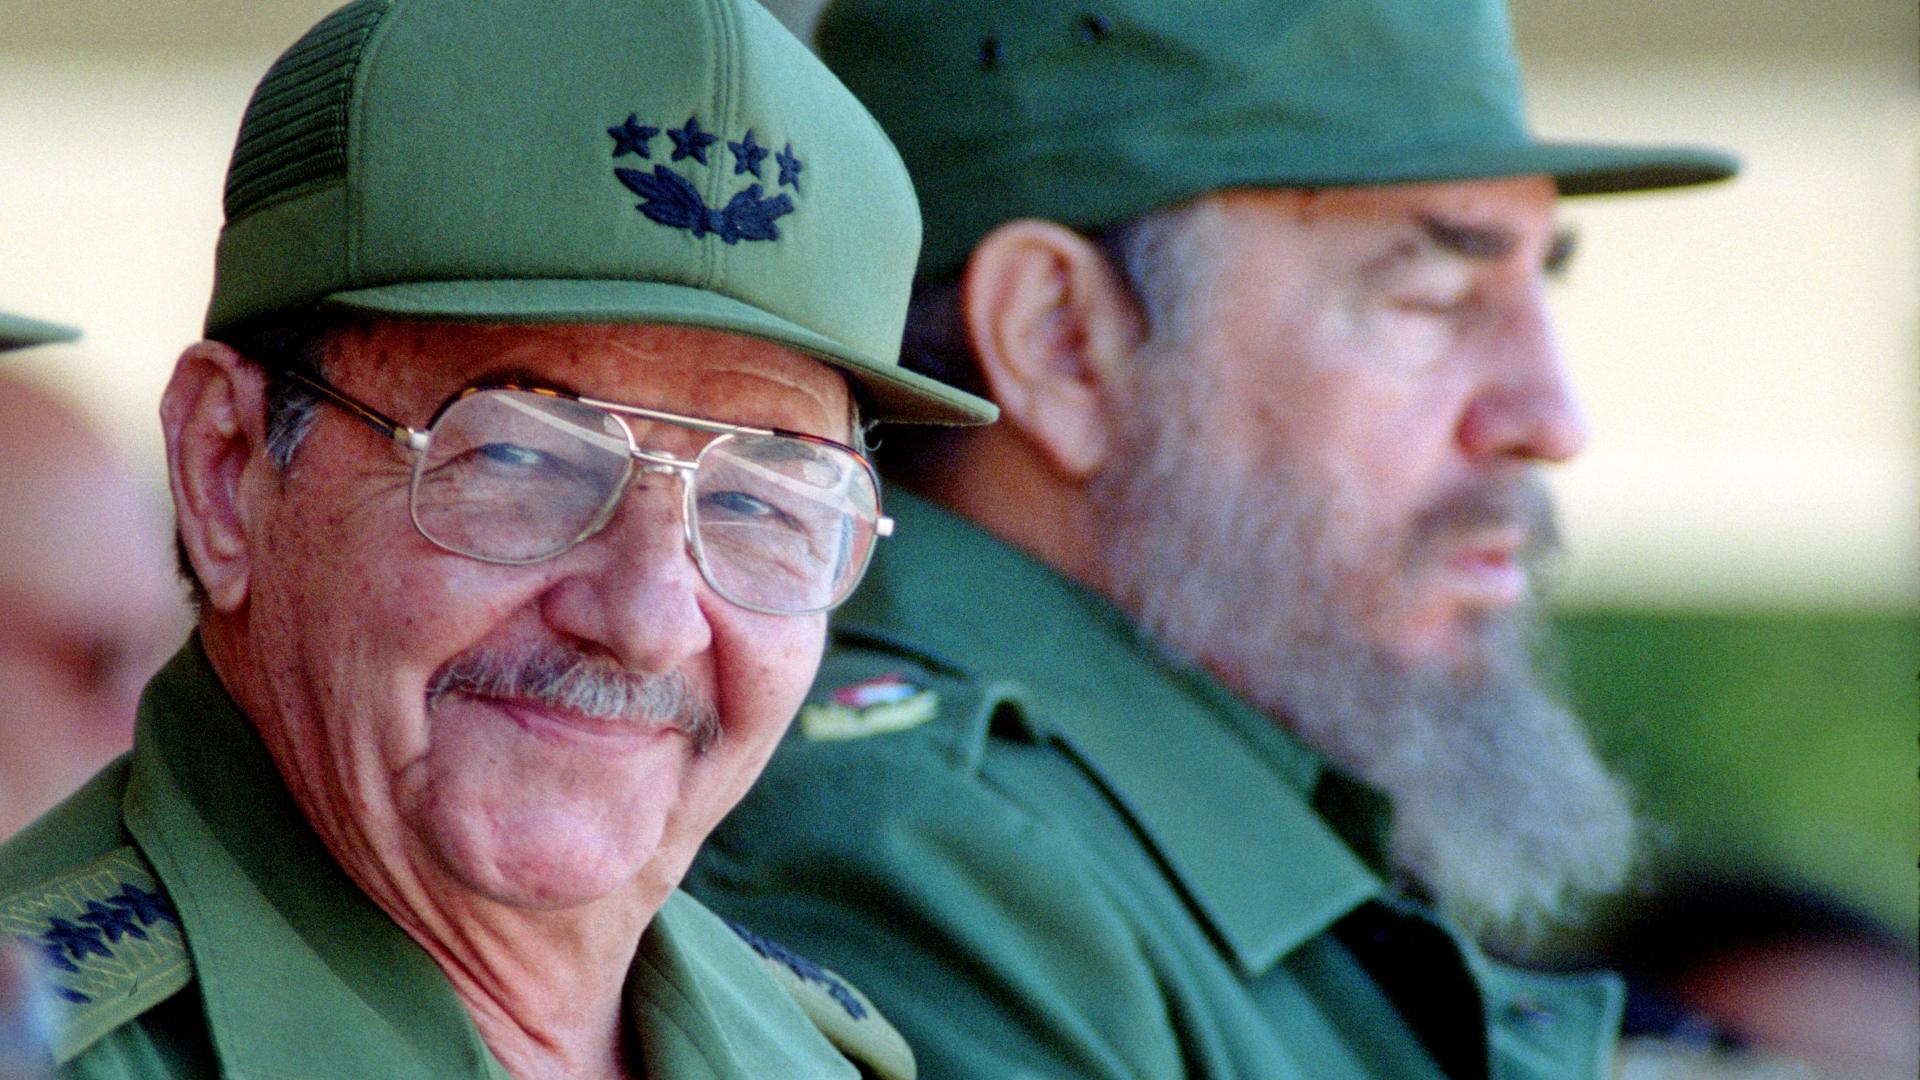 Raul and Fidel Castro. (Credit: Sven Creutzmann/Mambo Photography/Getty Images)